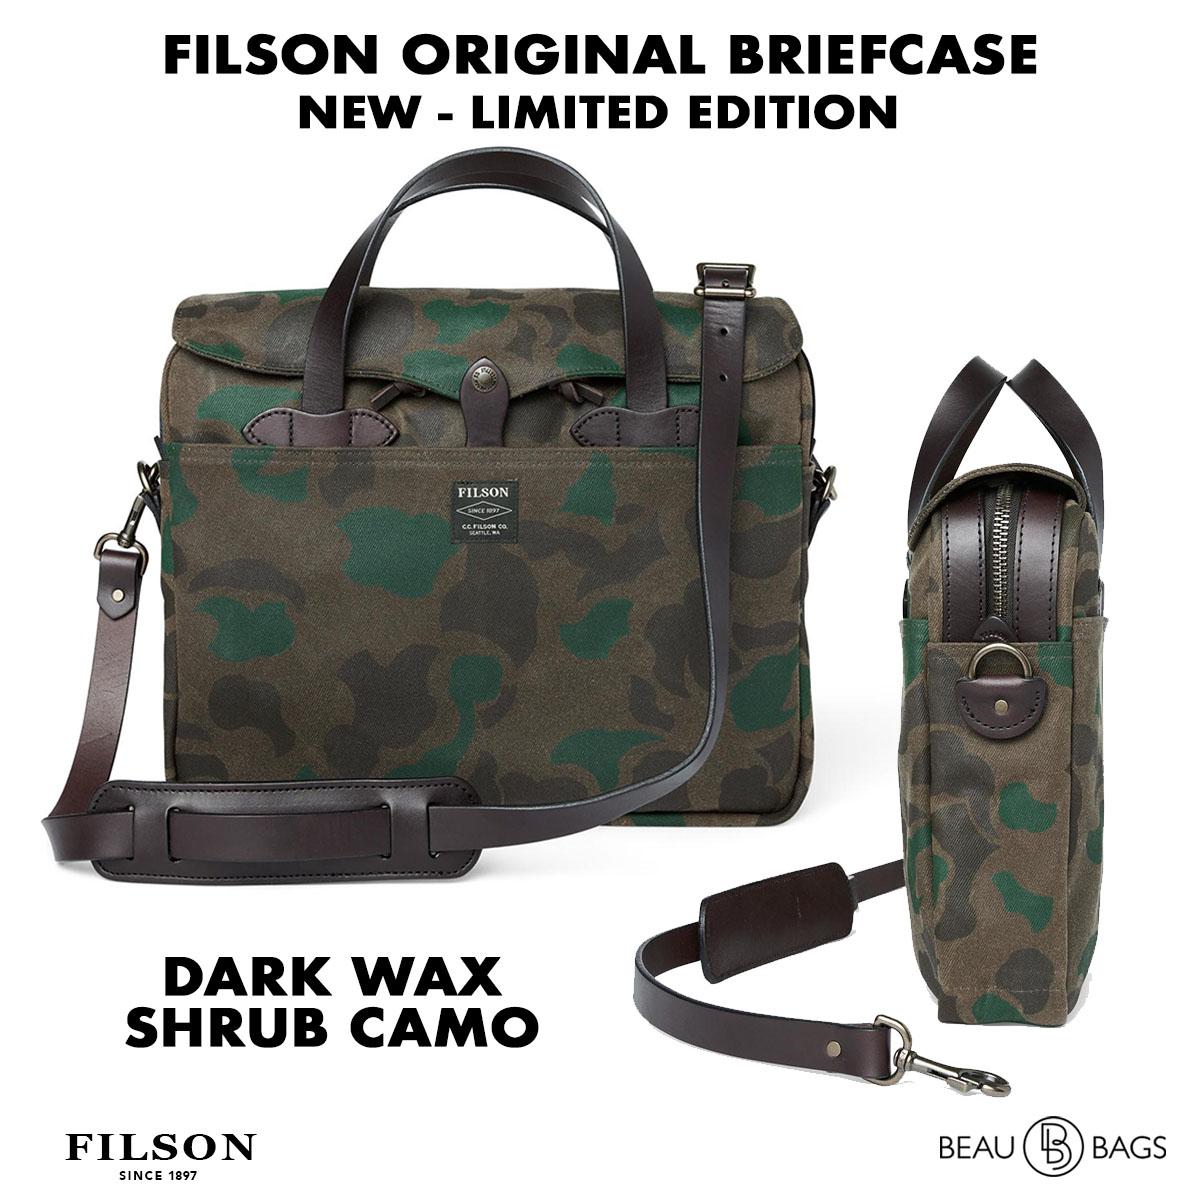 Filson Waxed Rugged Twill Original Briefcase 20226928-Dark Wax Shrub Camo, limited Edition Camo uitvoering